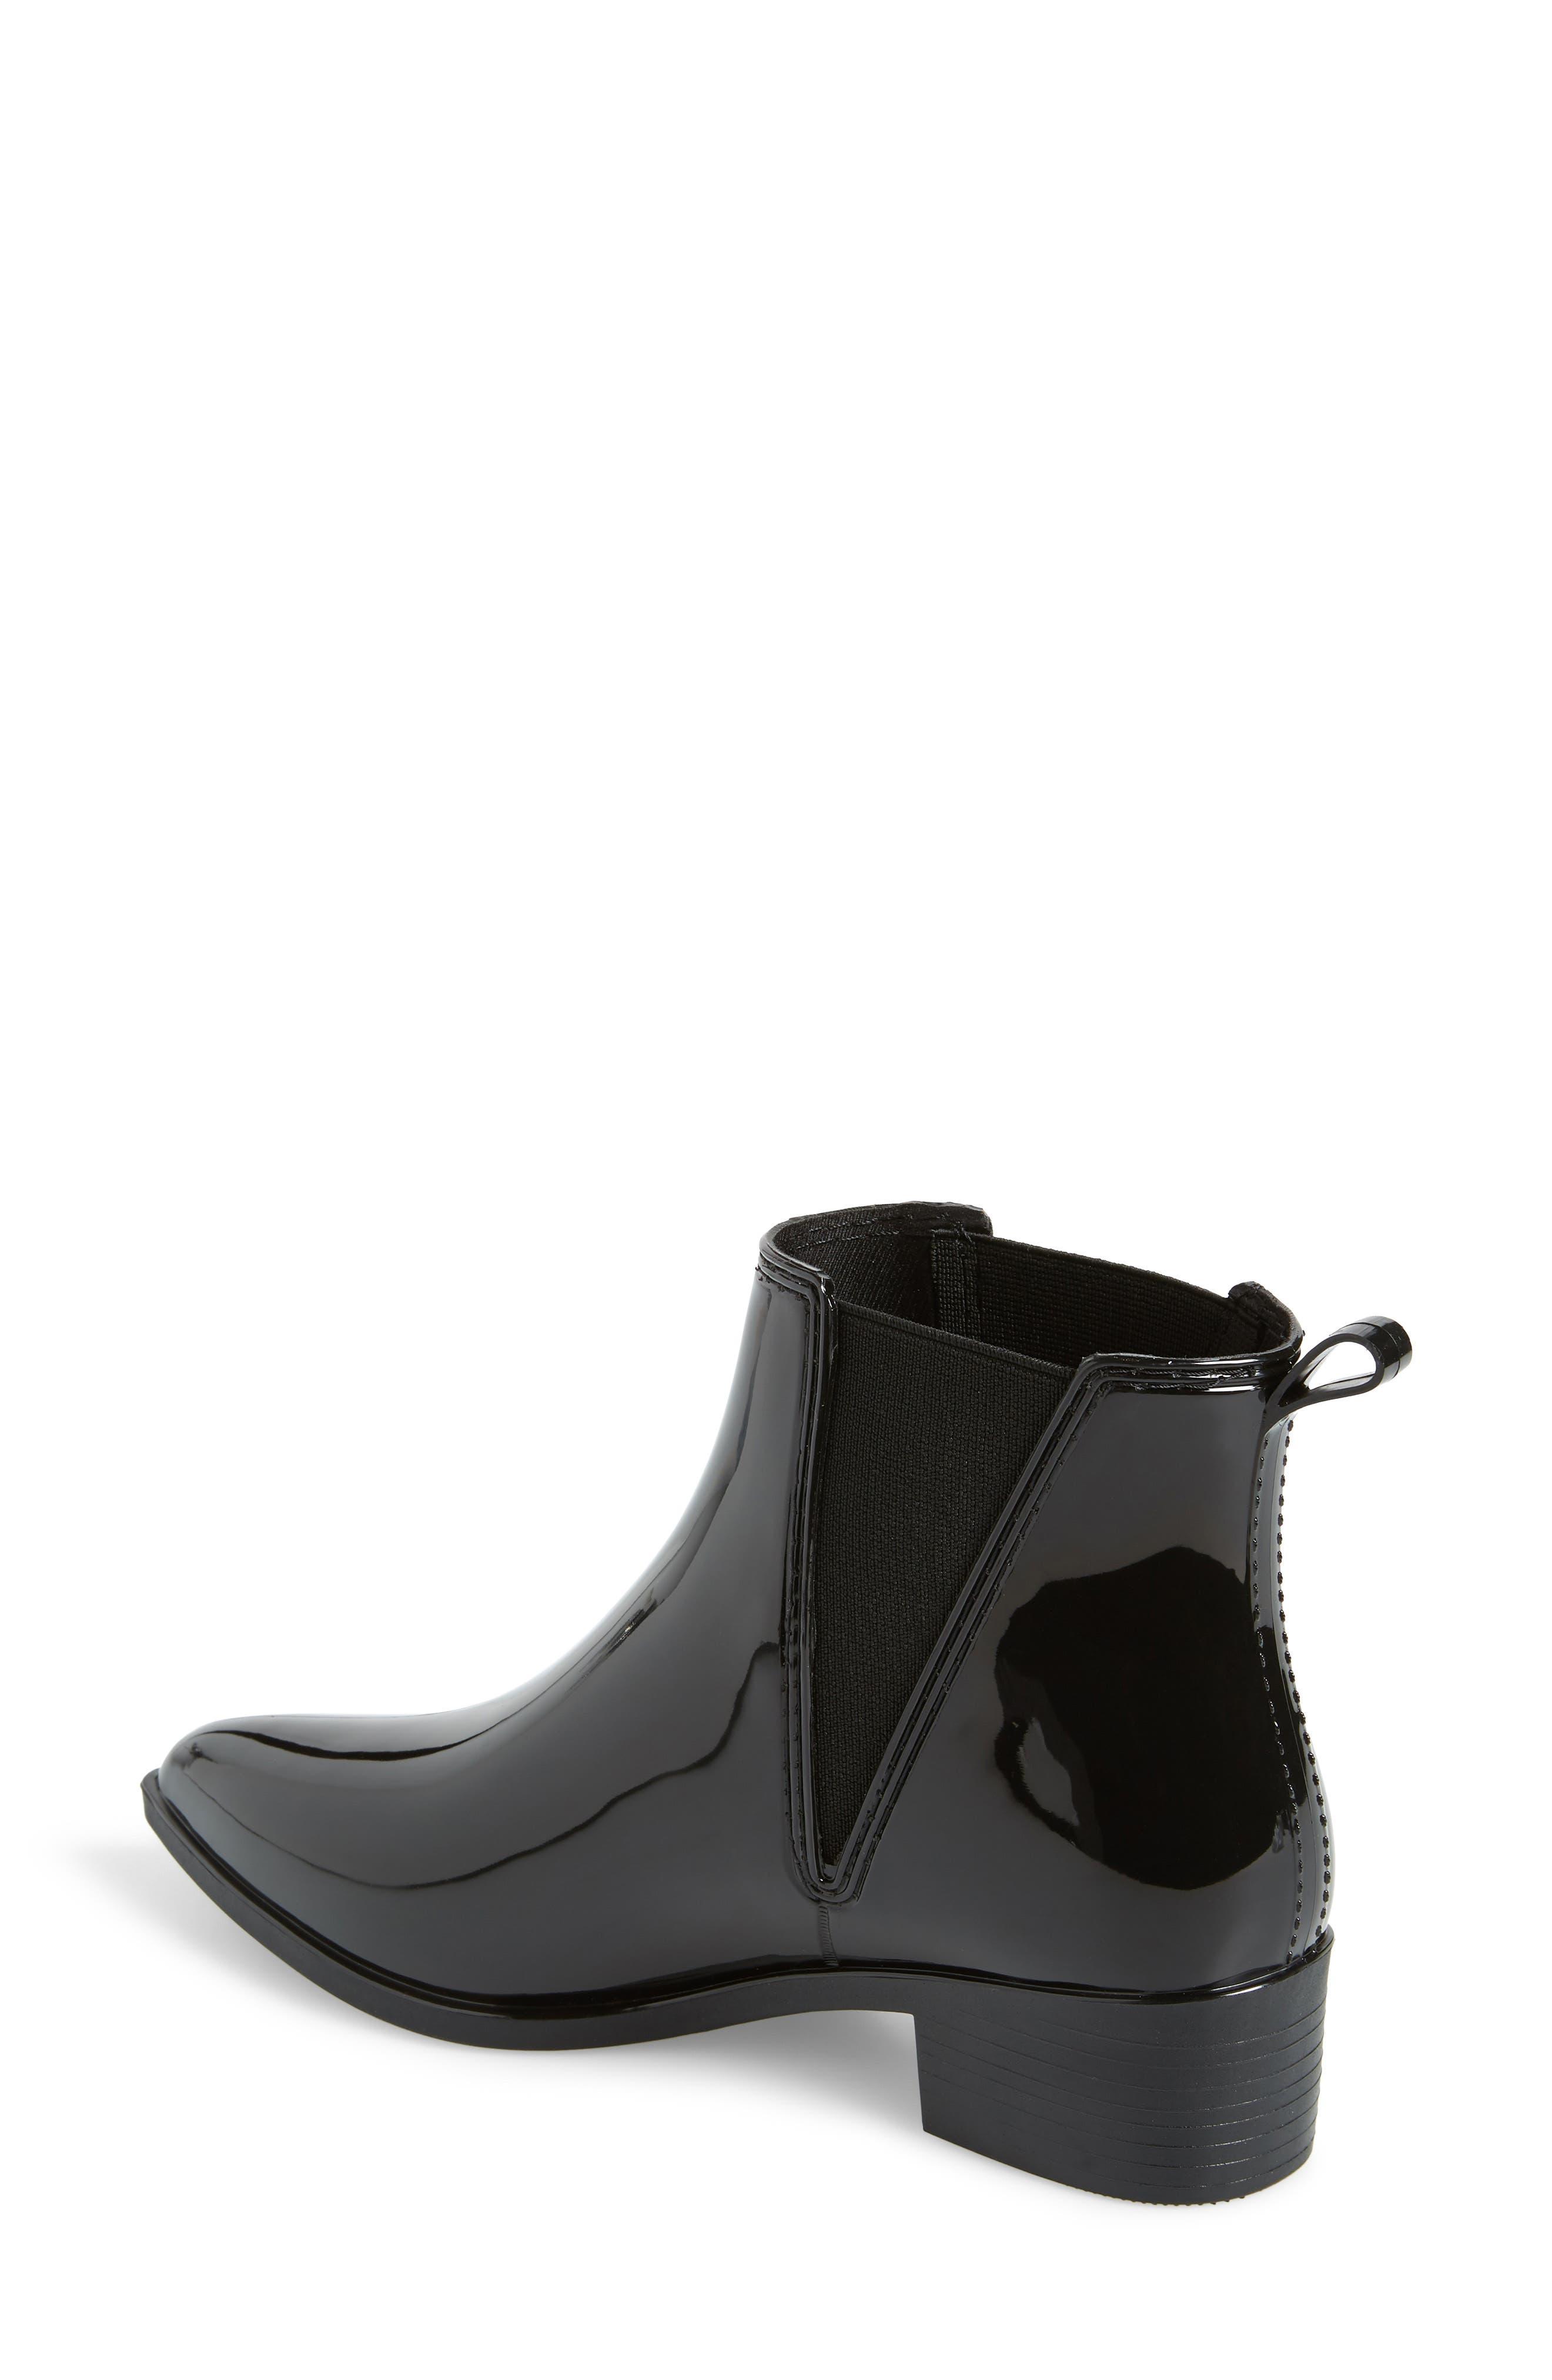 JEFFREY CAMPBELL, Mist Chelsea Waterproof Rain Boot, Alternate thumbnail 2, color, 002